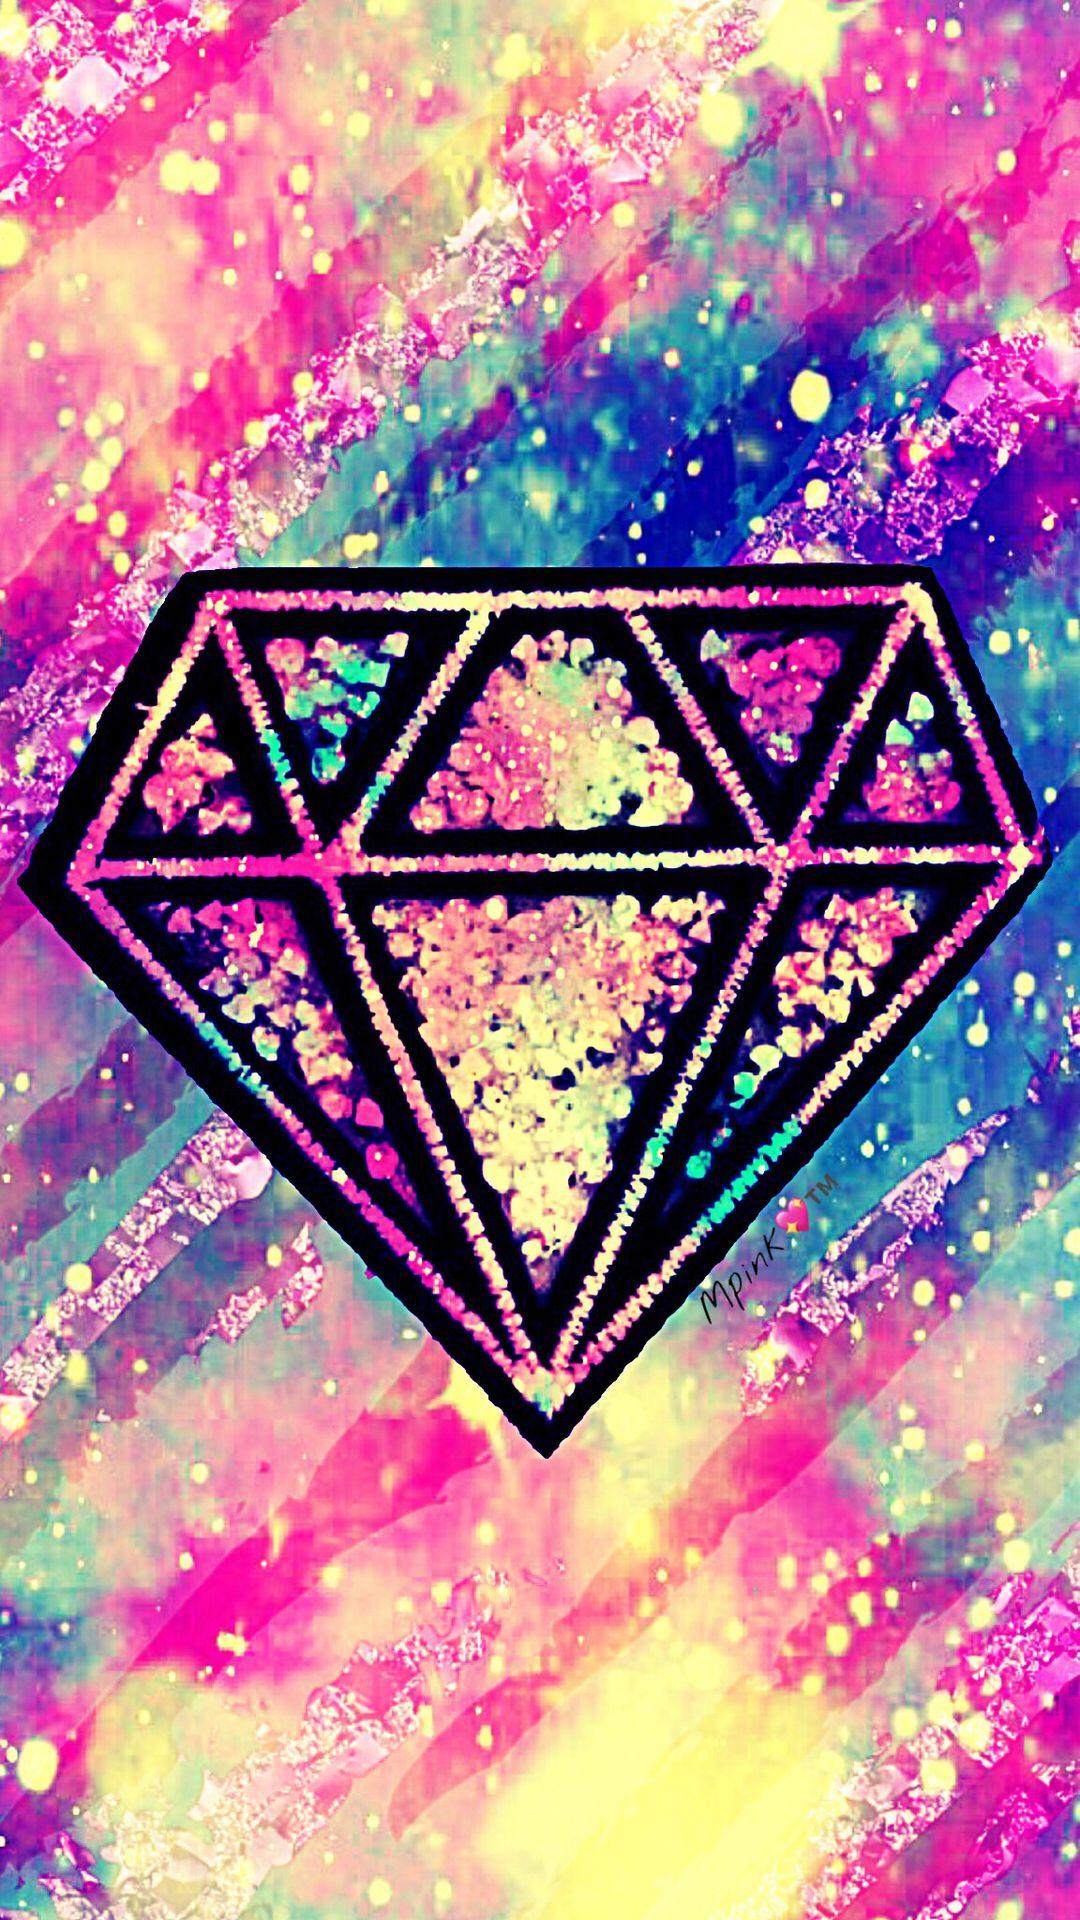 Glitter Girly Galaxy Wallpaper : glitter, girly, galaxy, wallpaper, Crystal, Diamond, Galaxy, Wallpaper, #androidwallpaper, #iphonewallpaper, #galaxy, #spa…, Glitter, Wallpaper,, Iphone, Disney, Princess